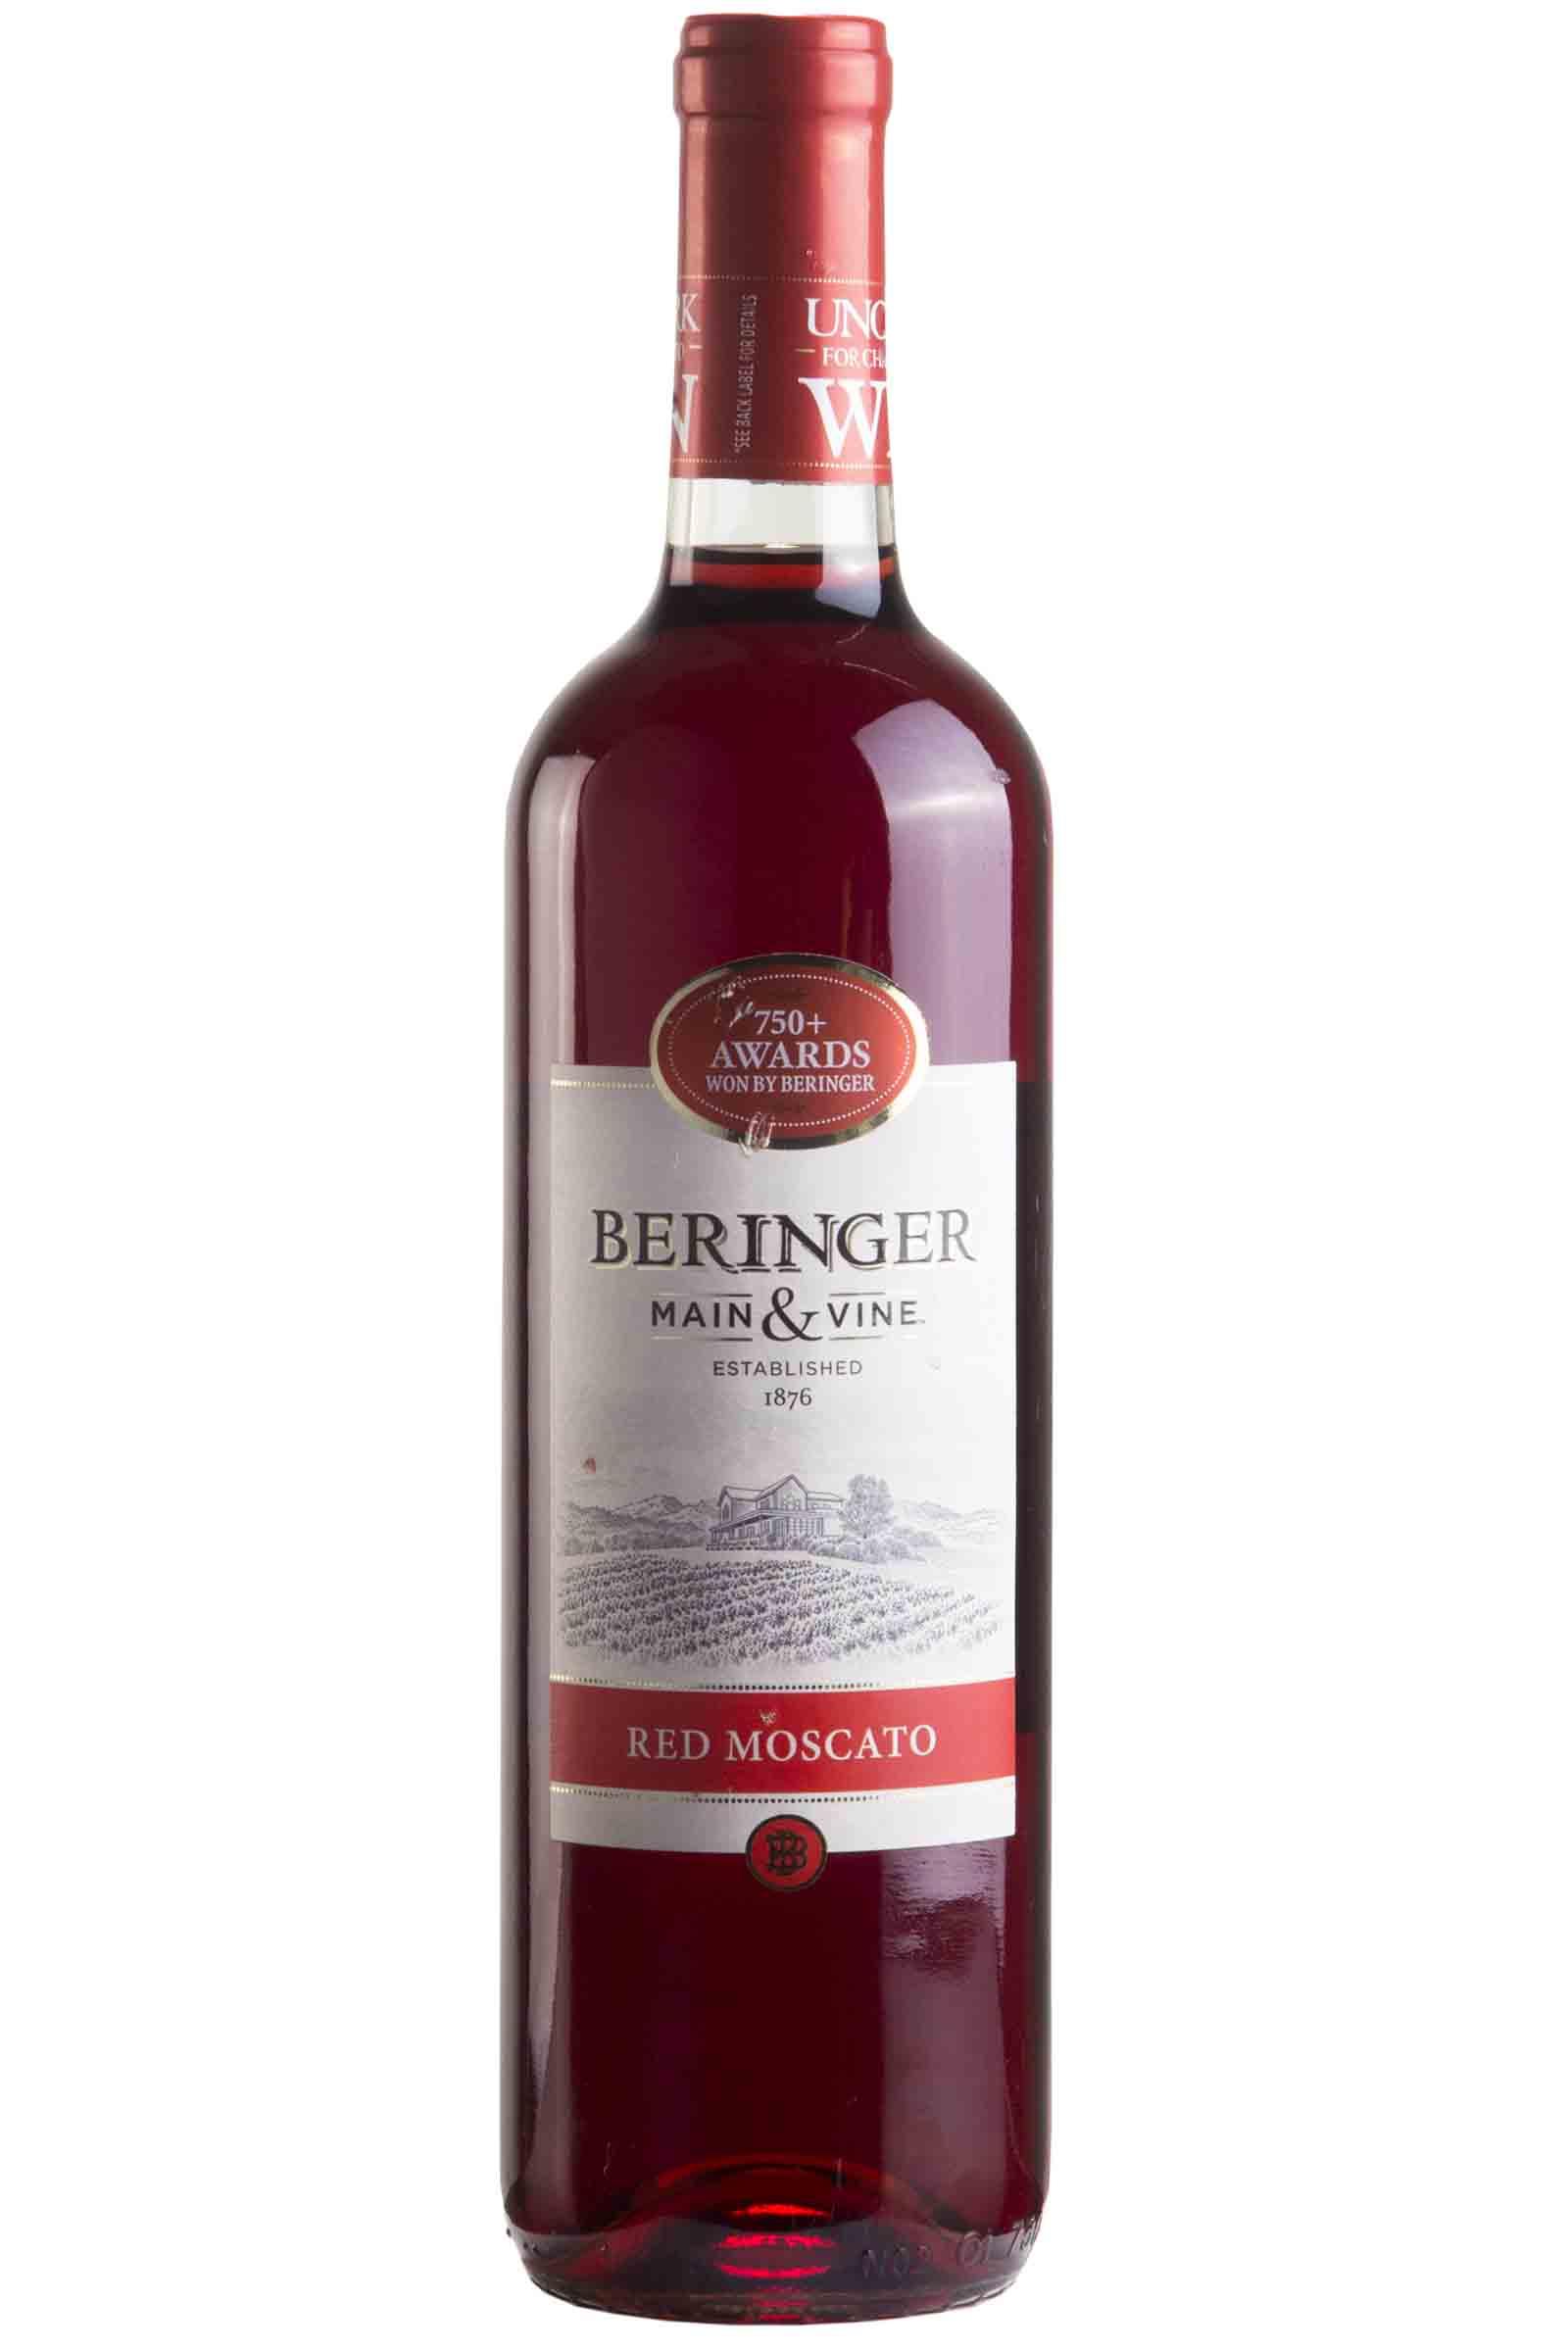 Vino Beringer Main & Wine Red Moscato 750ml